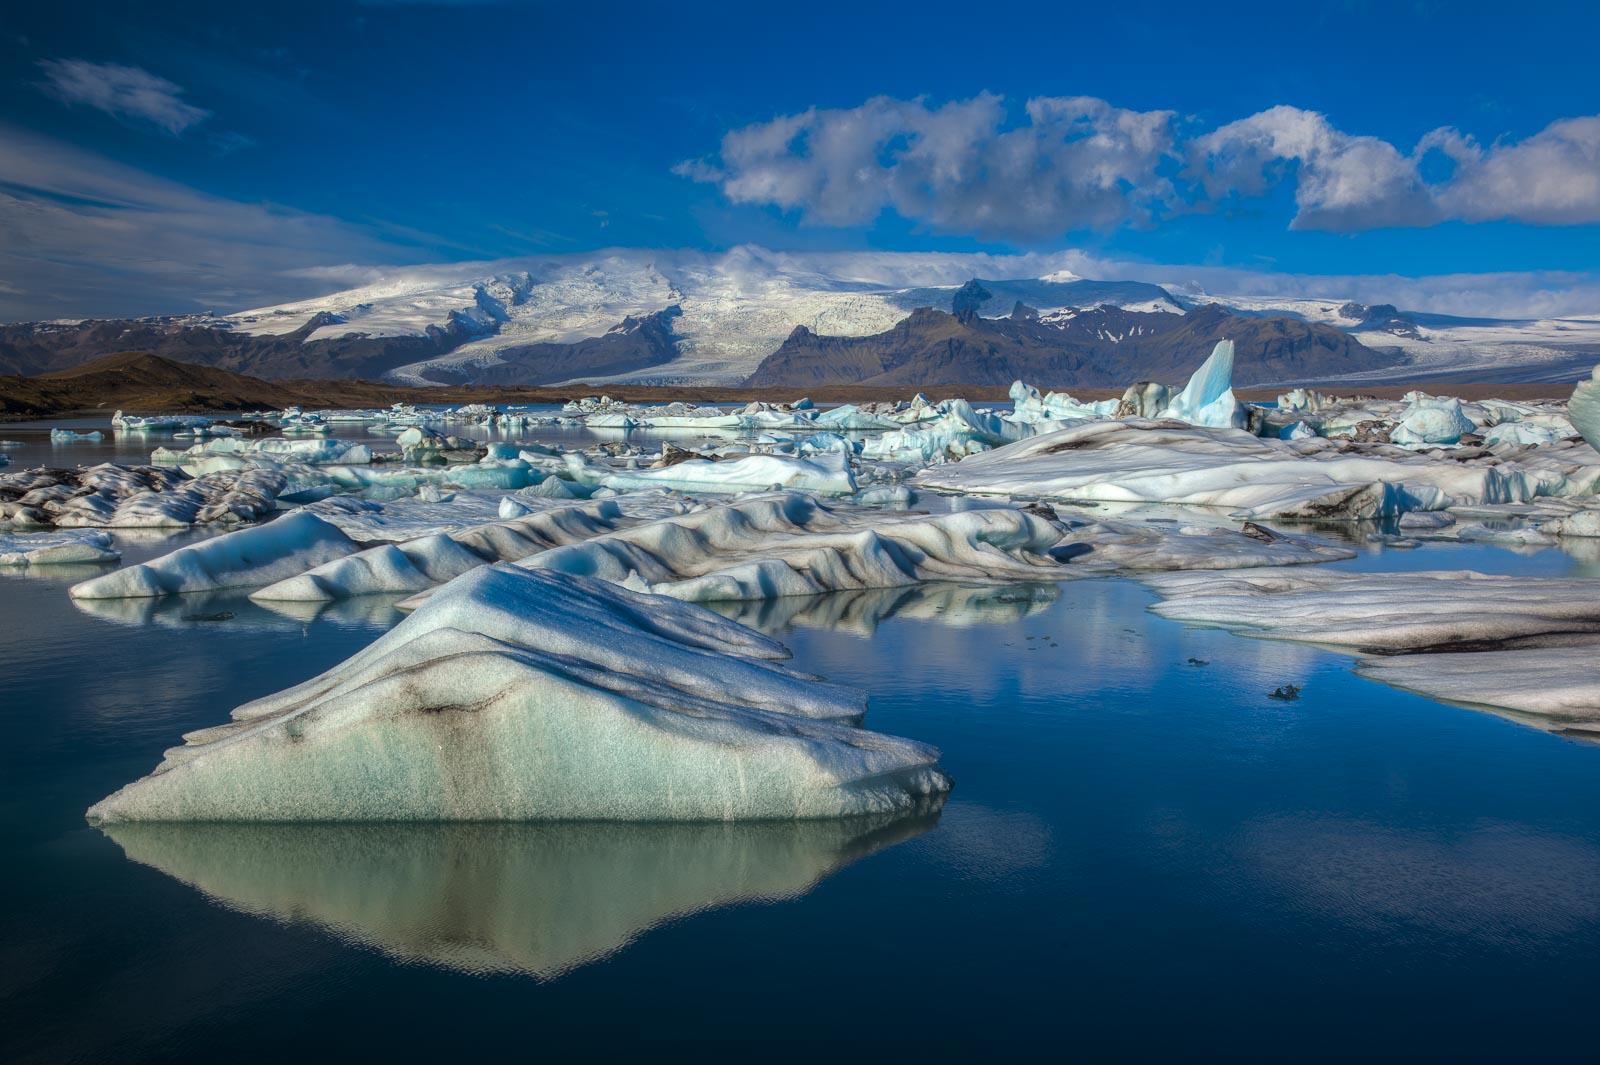 Icelands Jokulsarlon Glacial Lagoon